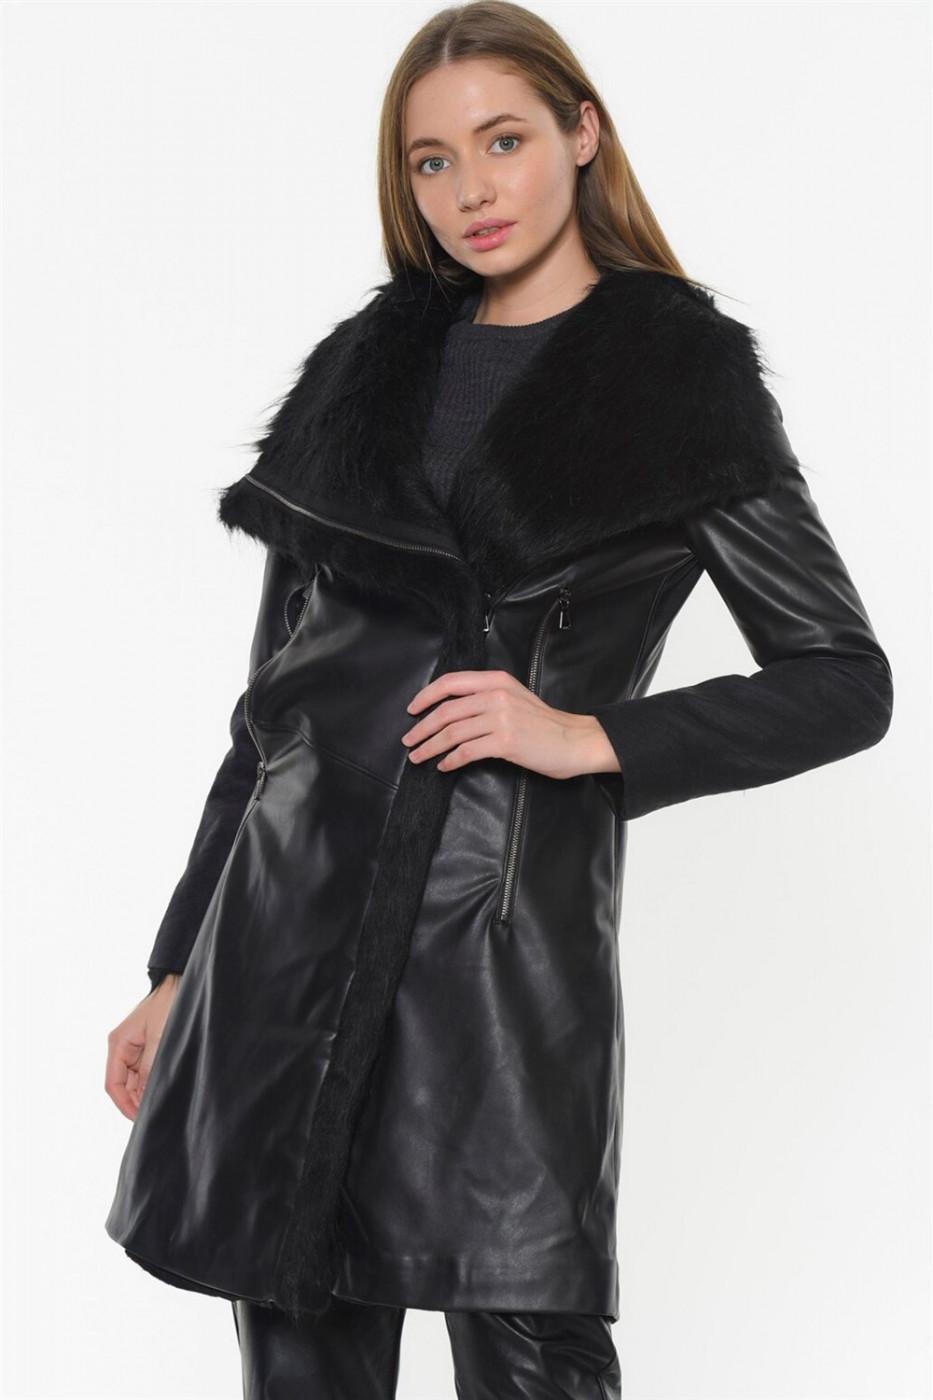 Z6614 DEWBERRY WOMEN FURRY LEATHER COAT-BLACK